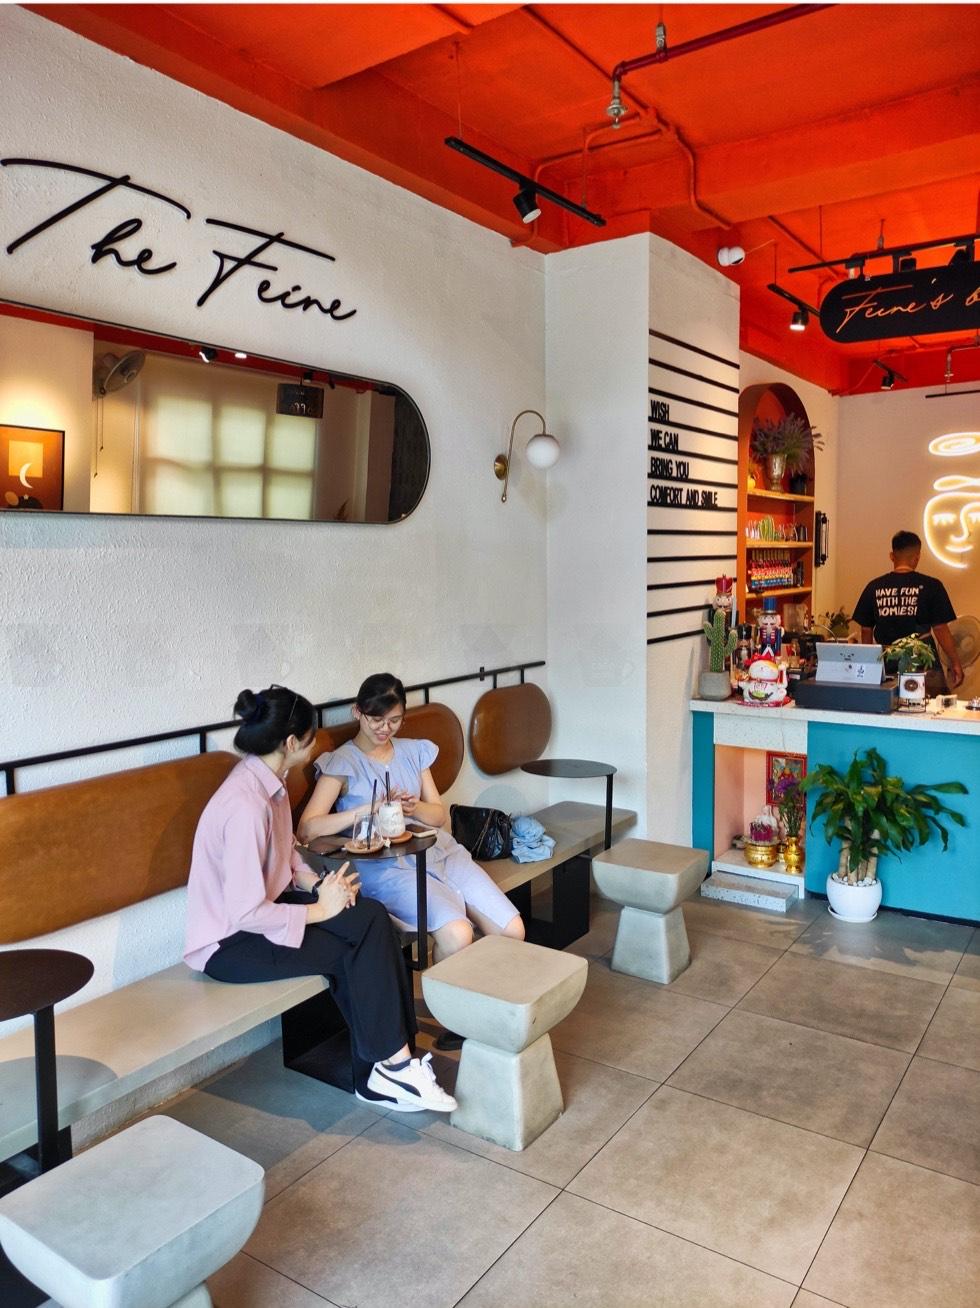 The Feine Cafe Decor